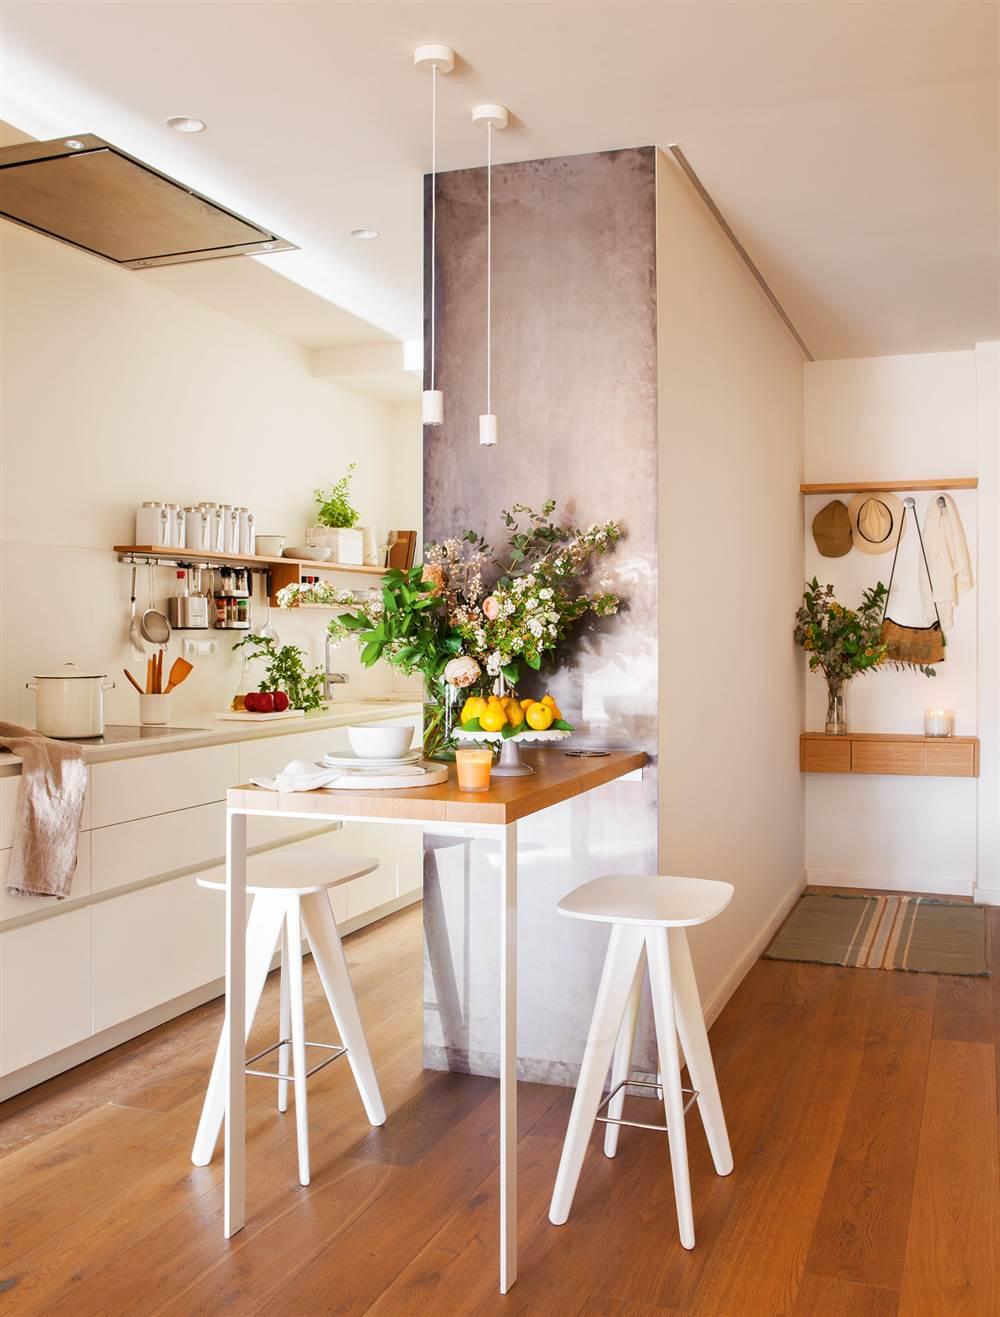 Diez pisos peque os con las mejores ideas para aprovechar for Ideas para decorar un piso